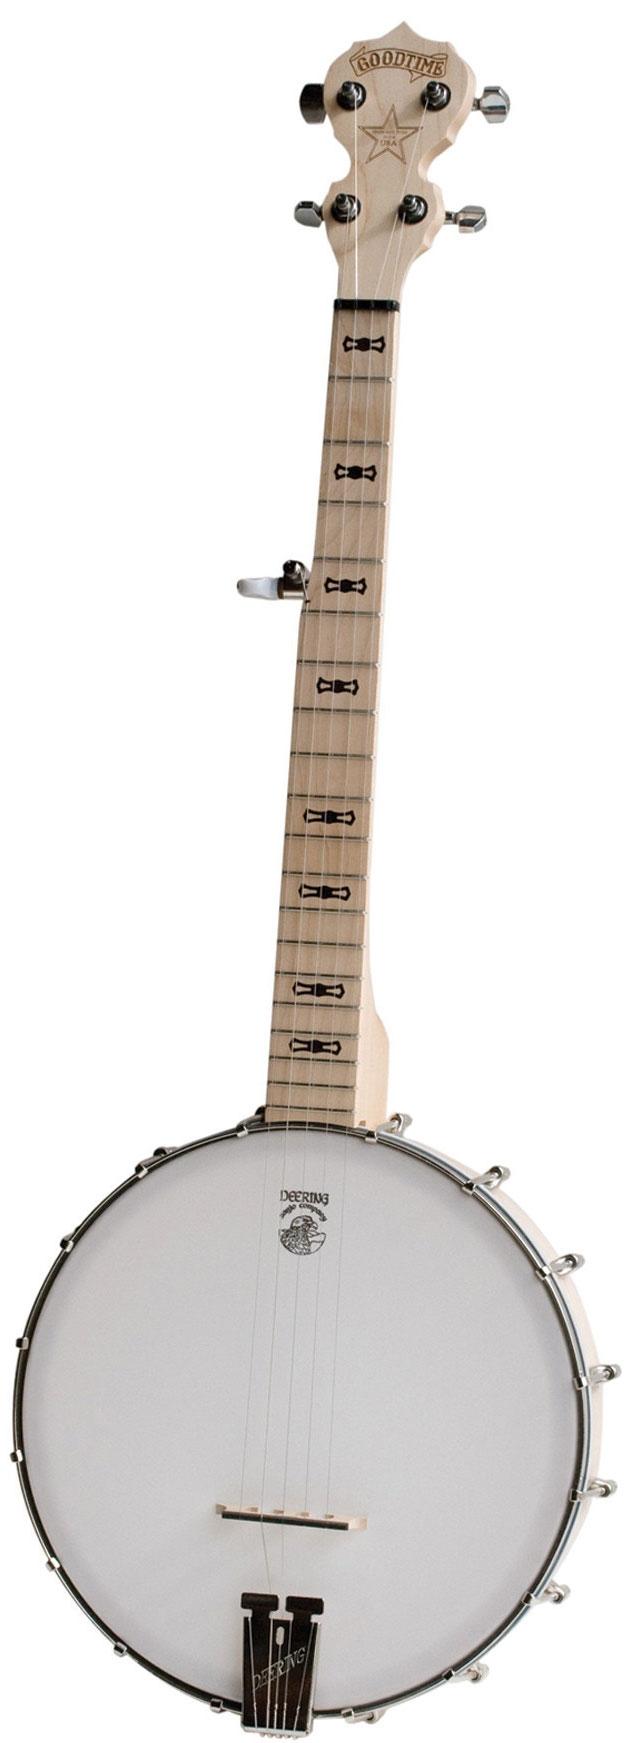 Goodtime Parlor - Deering Goodtime Parlour 5-string Banjo